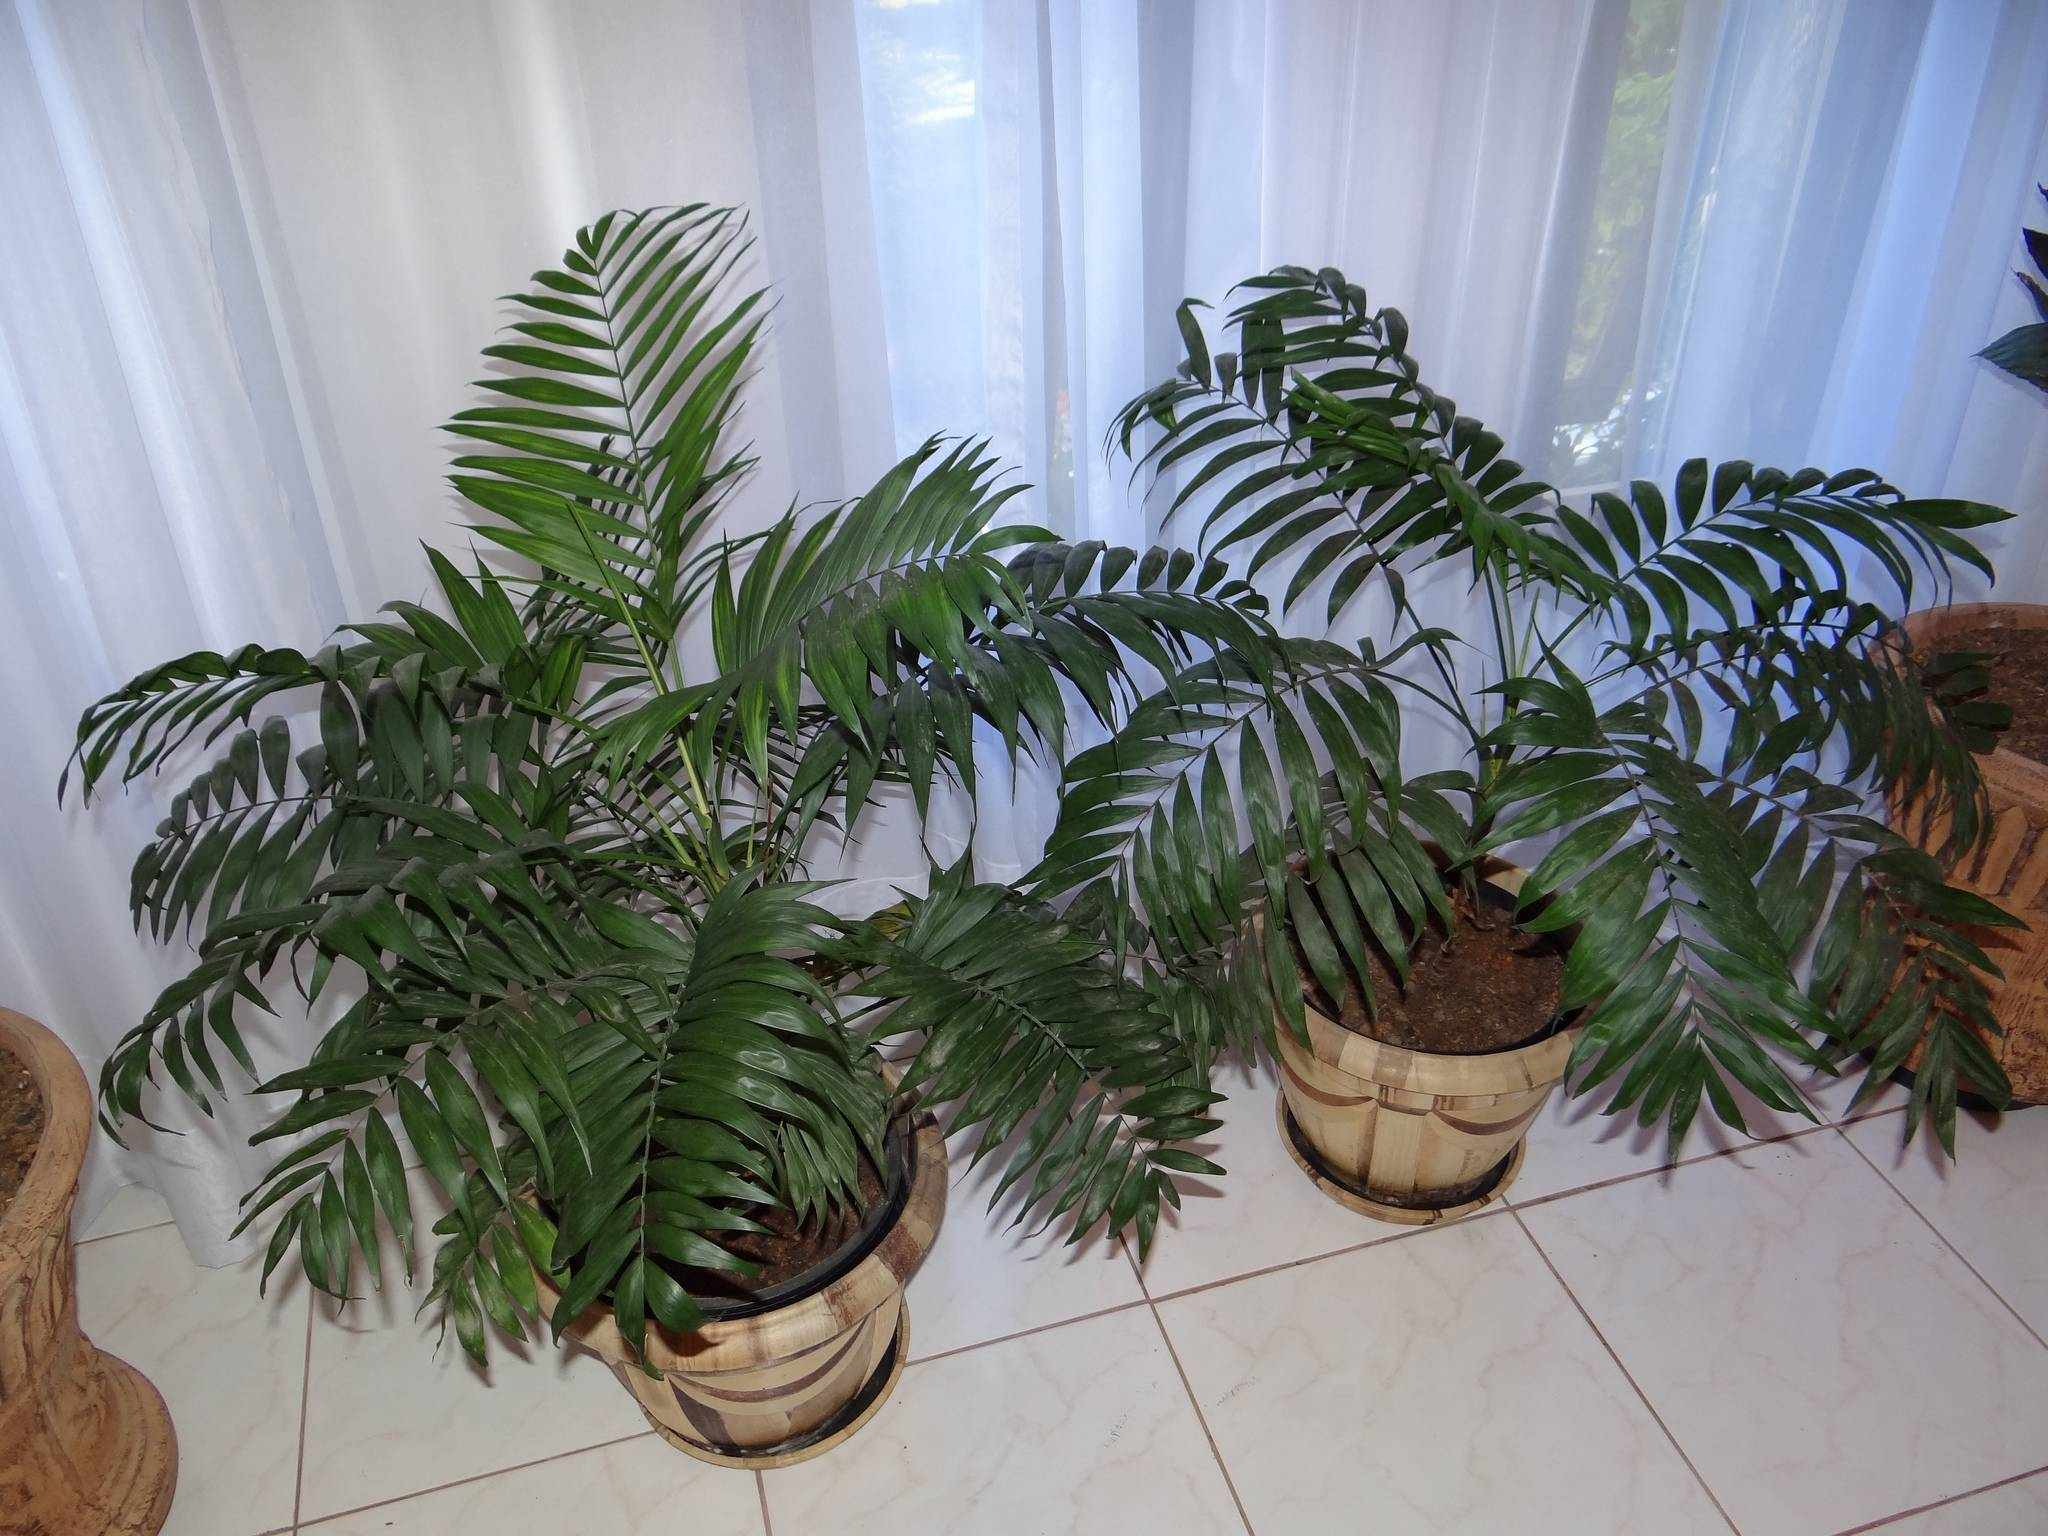 Выращивание хамедореи в домашних условиях